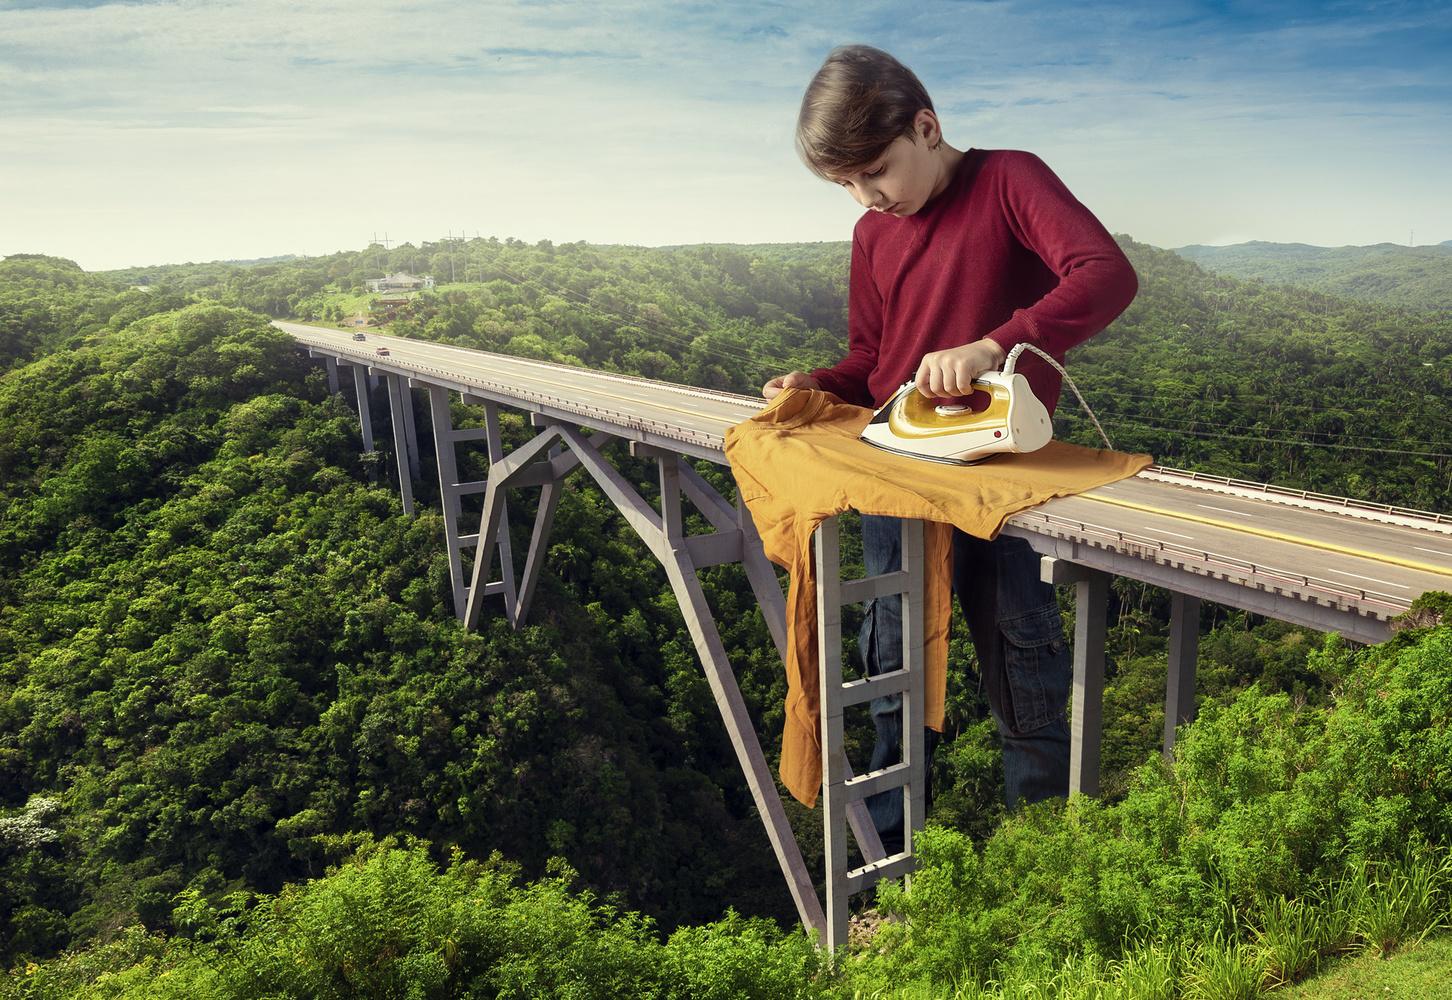 Bridge by Evgeny Loza